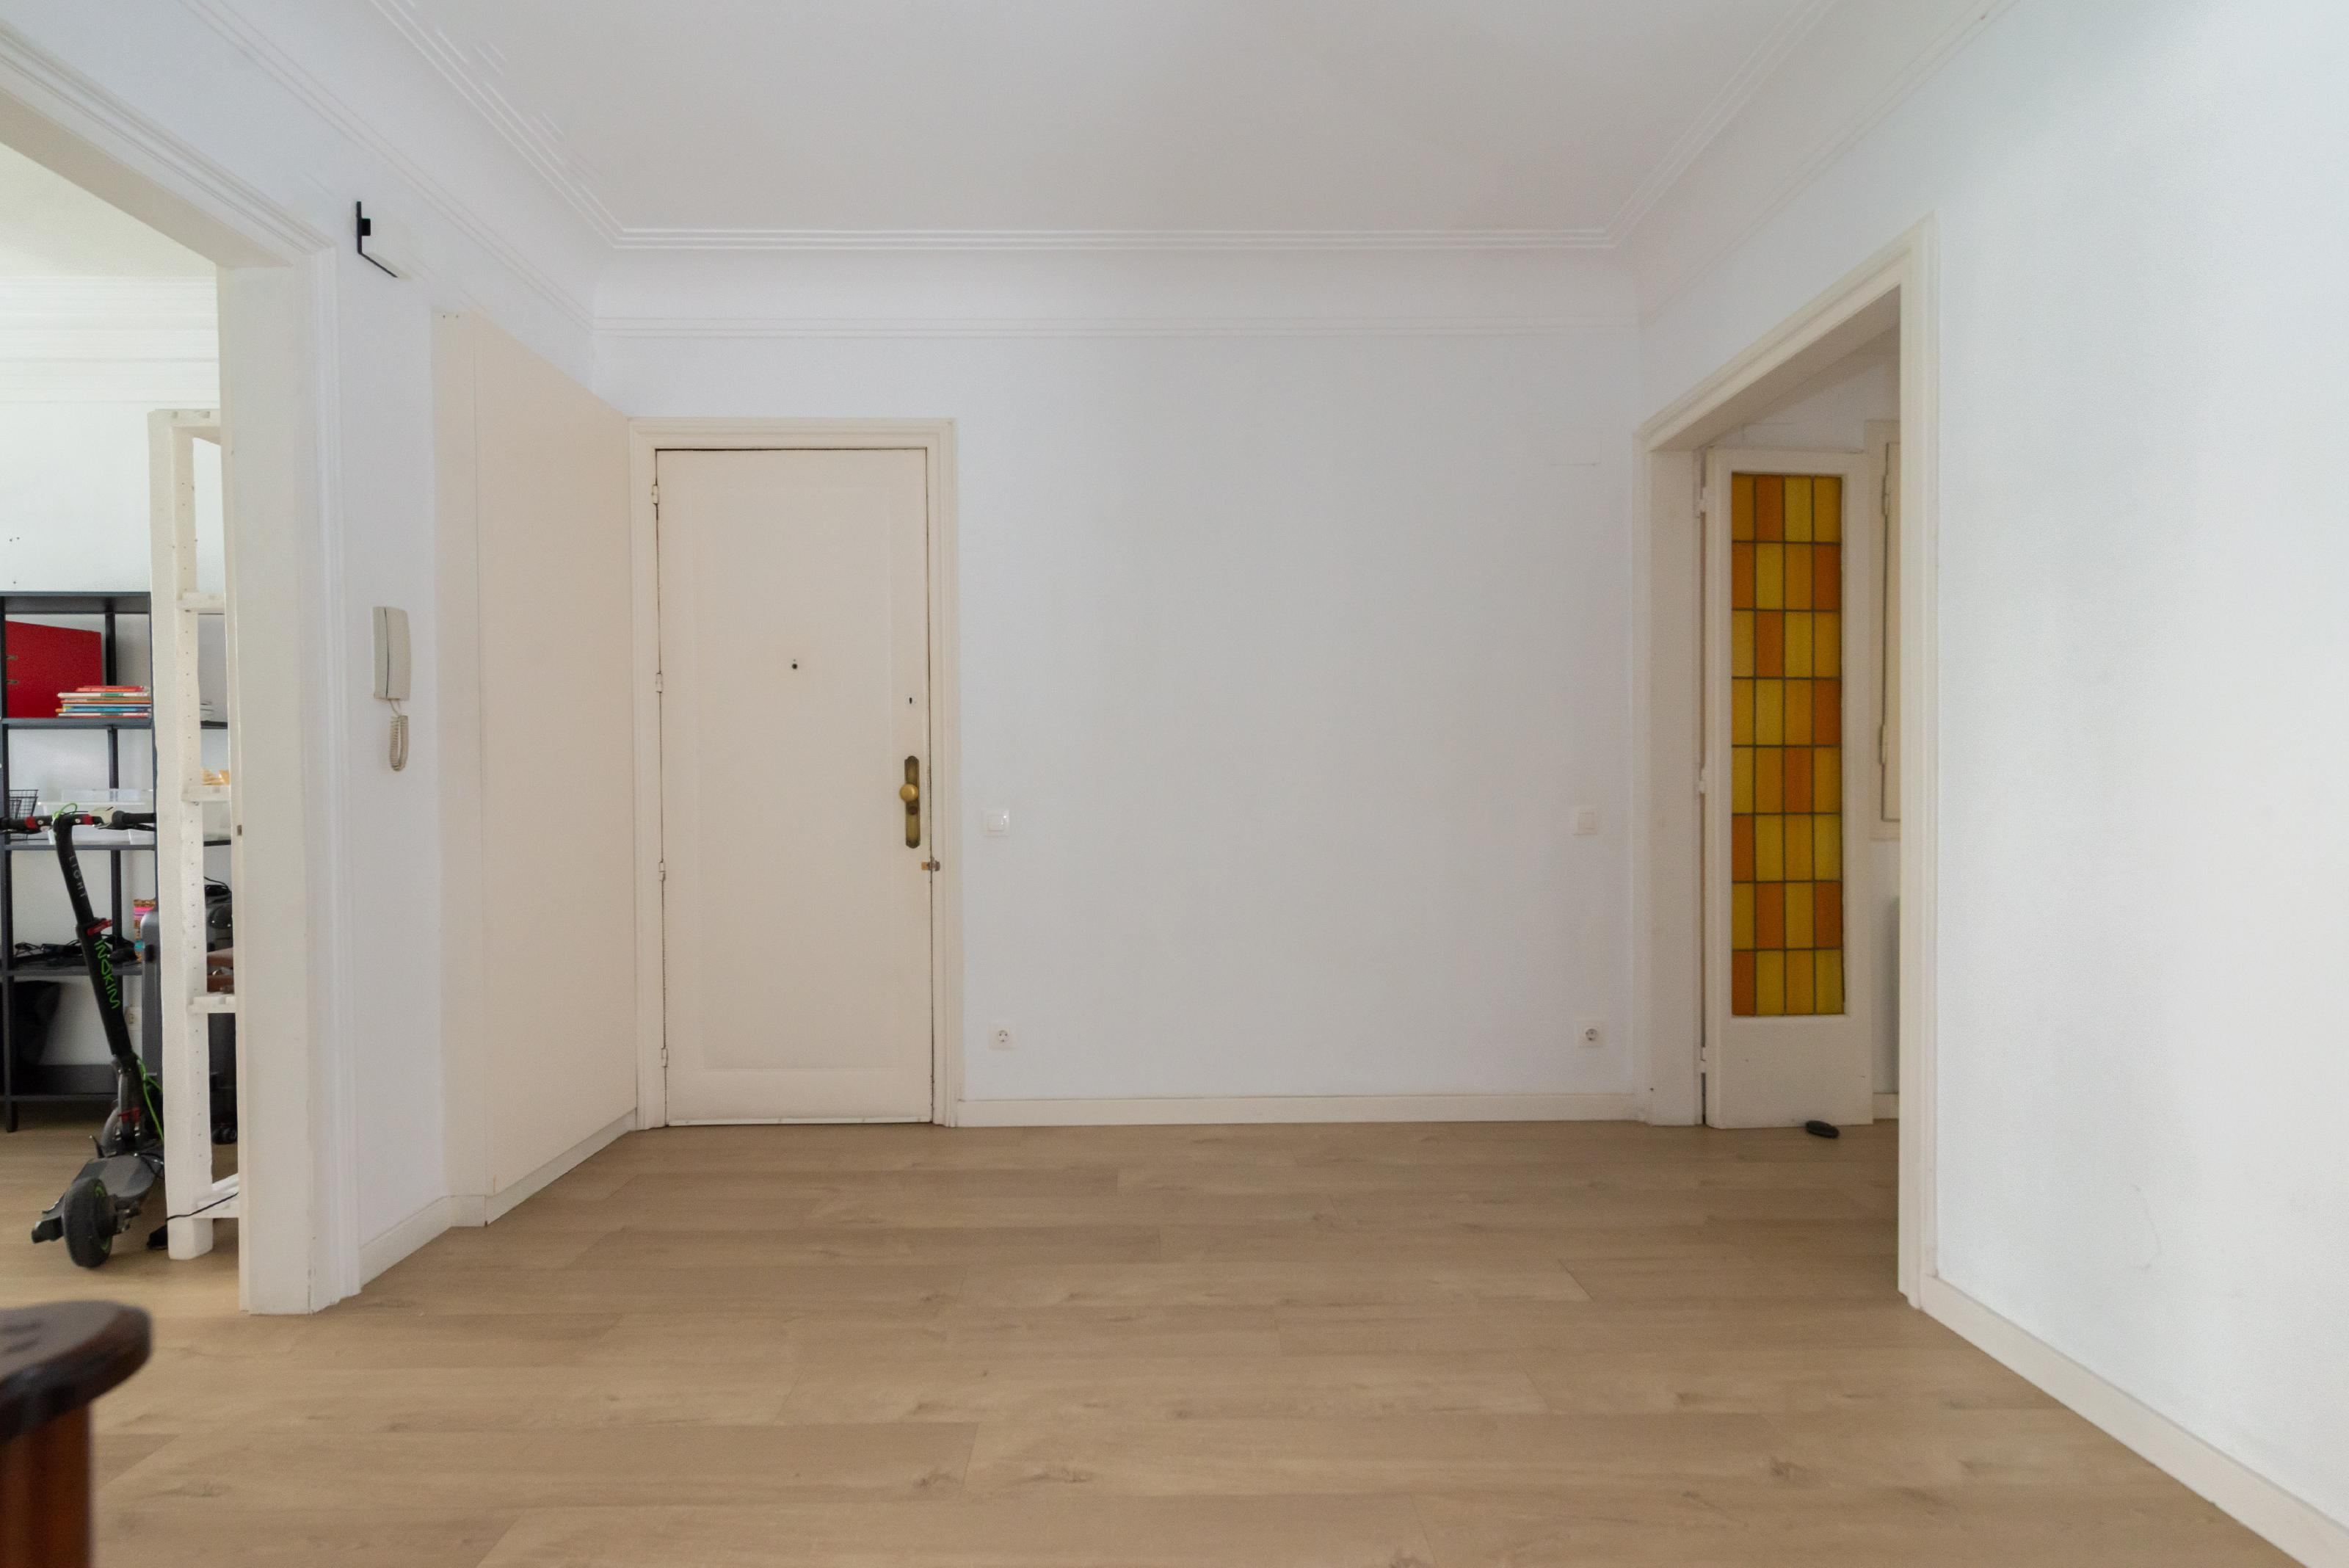 250005 Flat for sale in Sarrià-Sant Gervasi, Sant Gervasi-Galvany 18